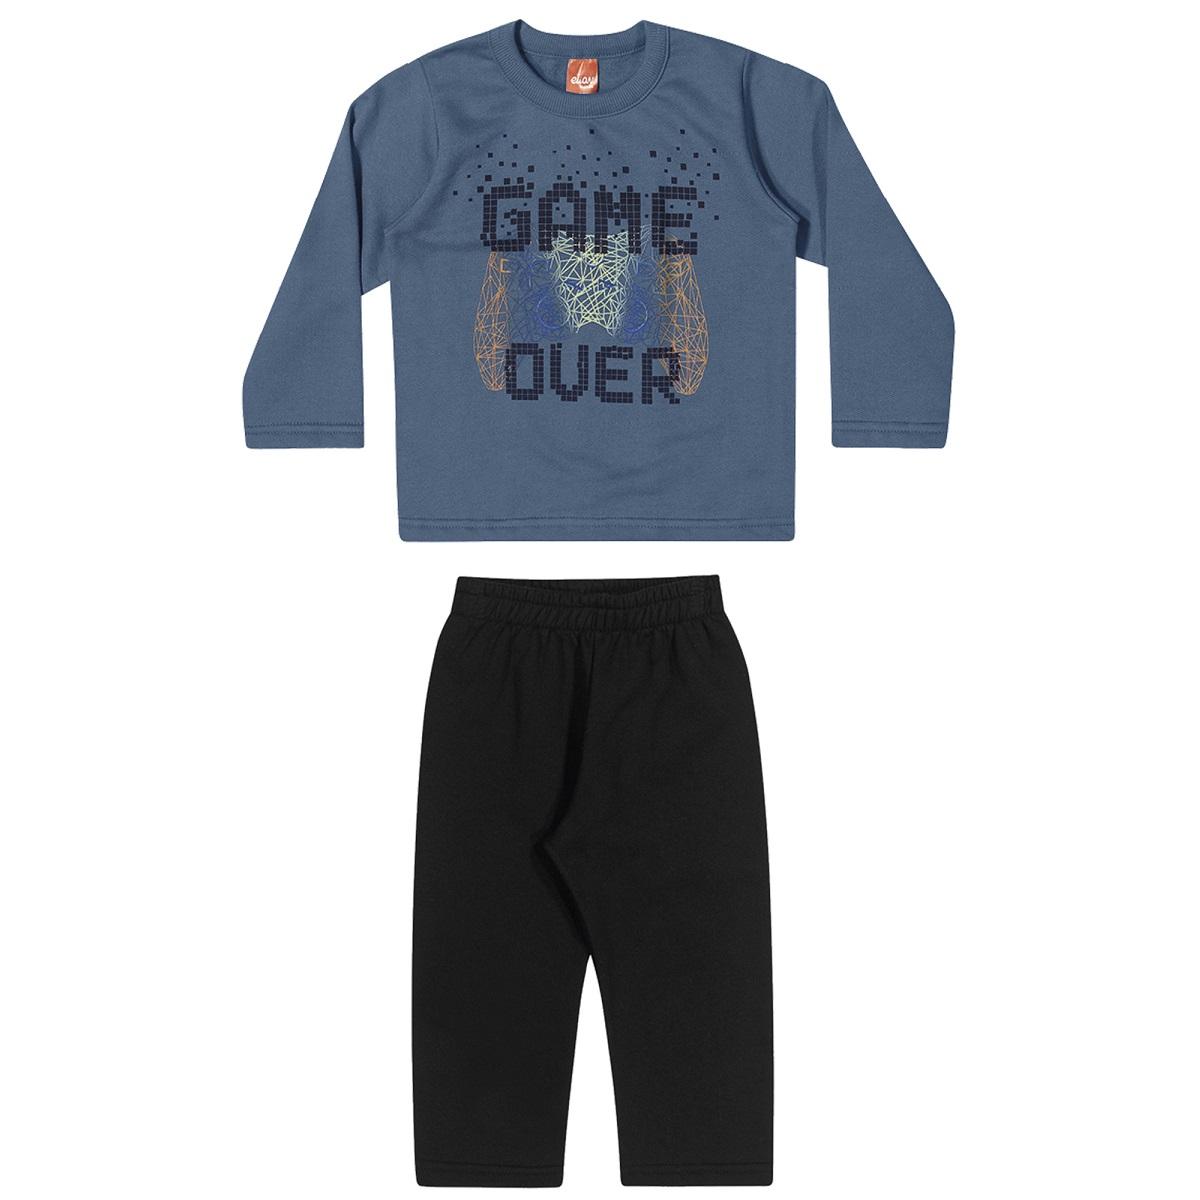 Conjunto Infantil Masculino Blusa e Calça - ELIAN 221124